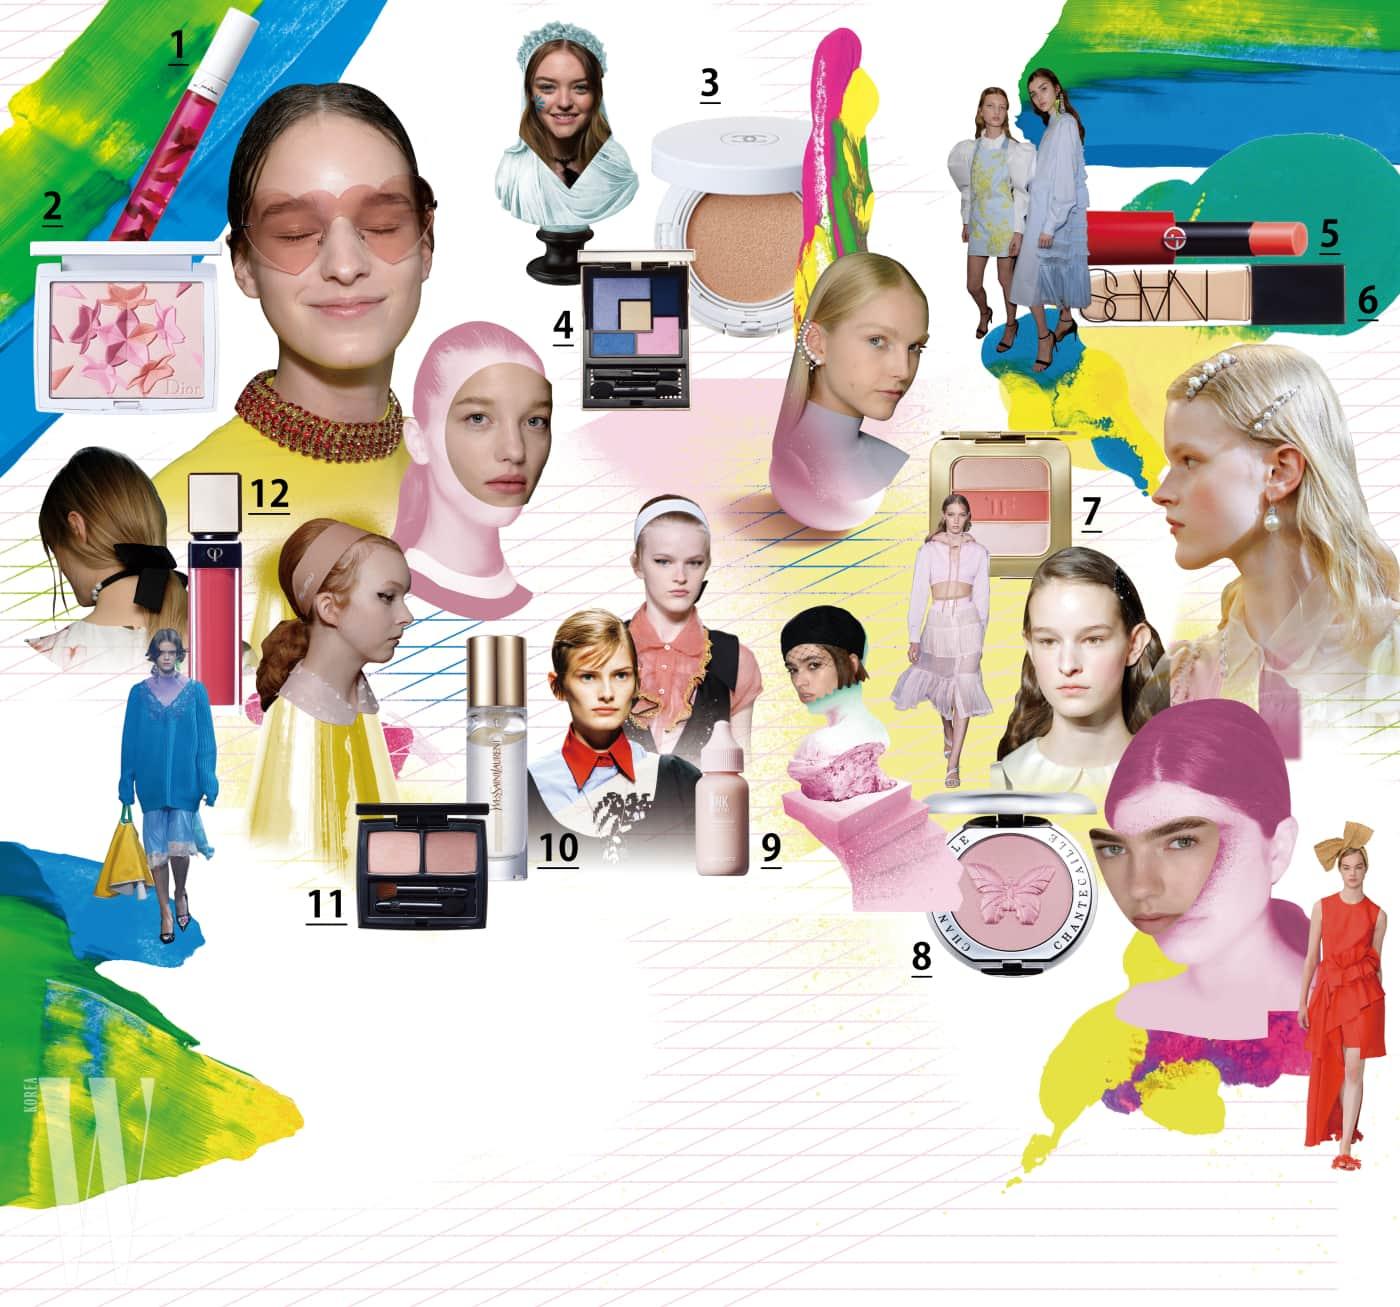 1. Lancome 로즈 젤리 틴트 3.6g, 3만9천원. 2. Dior 디올스노우 블러쉬 앤 블룸(002호) 14g, 7만2천원. 3. Chanel 르 블랑 오일-인-크림 컴팩트 파운데이션 SPF50+/ PA++ 10g, 8만2천원. 4. Yves Saint Laurent 2018 스프링 꾸뛰르 팔레트 콜렉터 5g, 8만5천원. 5. Giorgio Armani 엑스터시 샤인 3g, 4만4천원. 6. Nars 네츄럴 래디언트 롱웨어 파운데이션 30ml, 1만원. 7. Tom Ford Beauty 쏠레이 컨투어링 컴팩트(누드 글로우) 20g, 12만7천원. 8. Chantecaille 치크 섀이드 필란트로피 컬렉션(블리스) 2.5g,5만8천원. 9. Peripera 잉크 뽀얀 스킨 틴트(4호) 30ml, 1만원. 10. Yves Saint Laurent 뚜쉬 에끌라 블러 프라이머 30ml, 6만9천원. 11. Hera 섀도 듀오 새틴(16호) 3.3g, 3만5천원. 12. Cle de Peau Beaute 래디언트 립글로스(7호) 8ml, 4만5천원대.